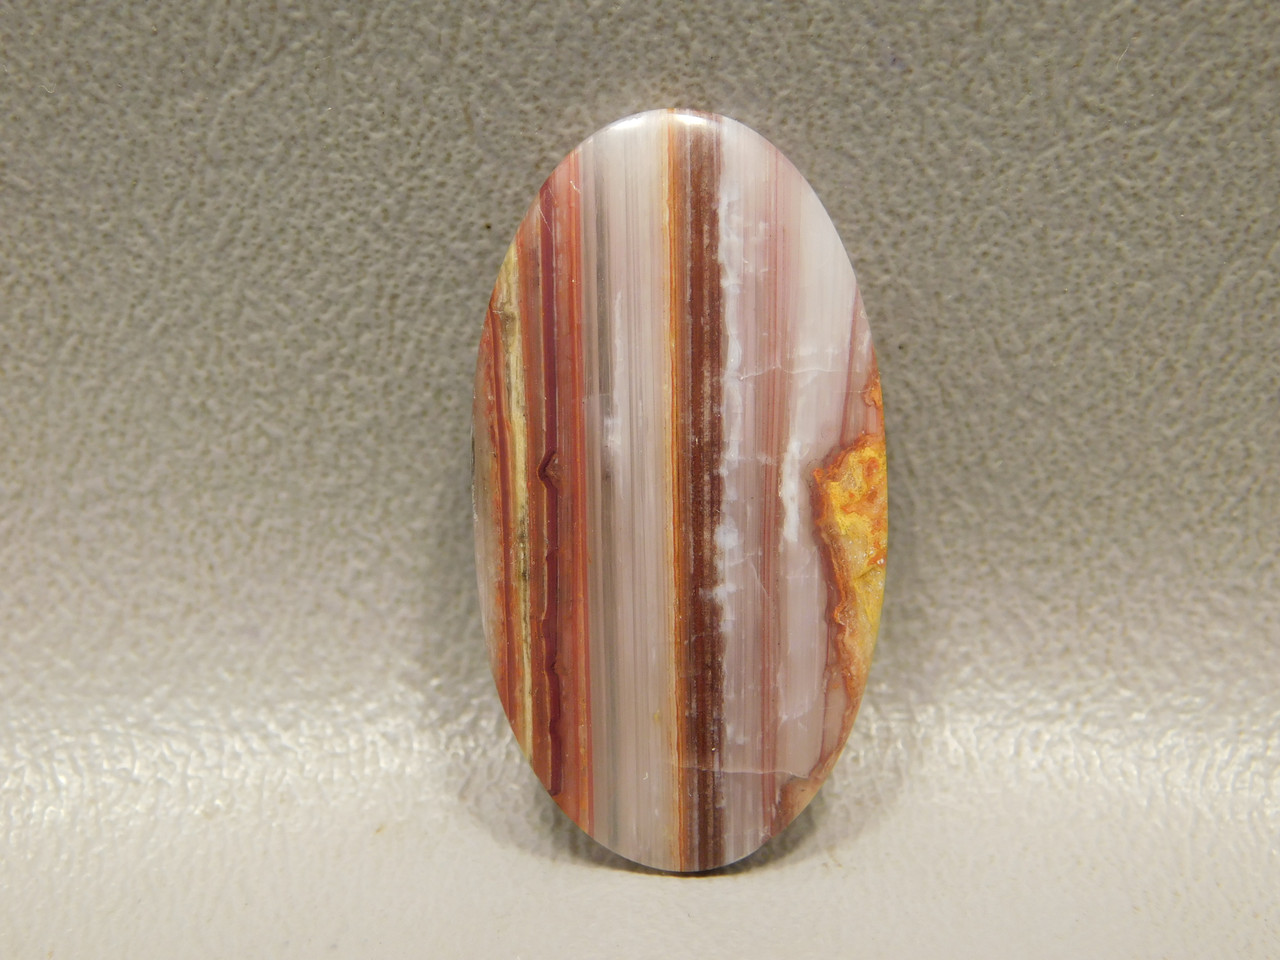 Candy Opal Designer Gemstone Cabochon Stone #7